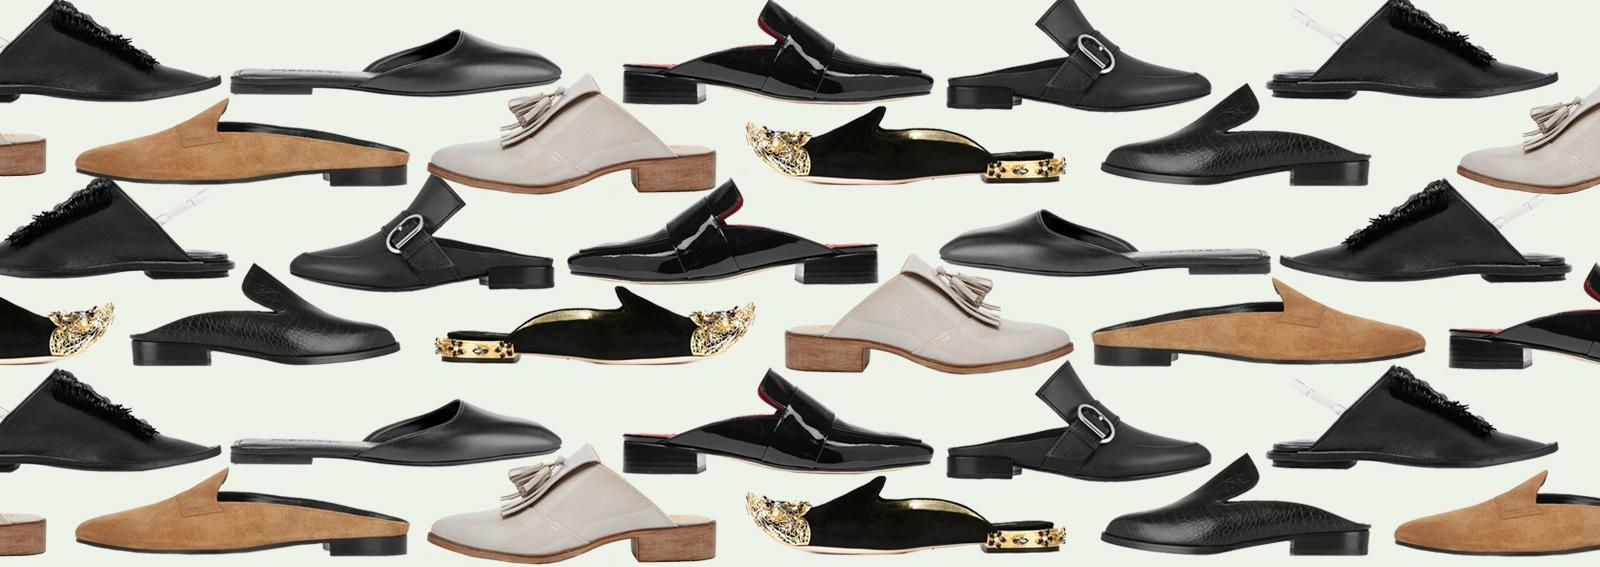 cover slippers pe 2016 desktop